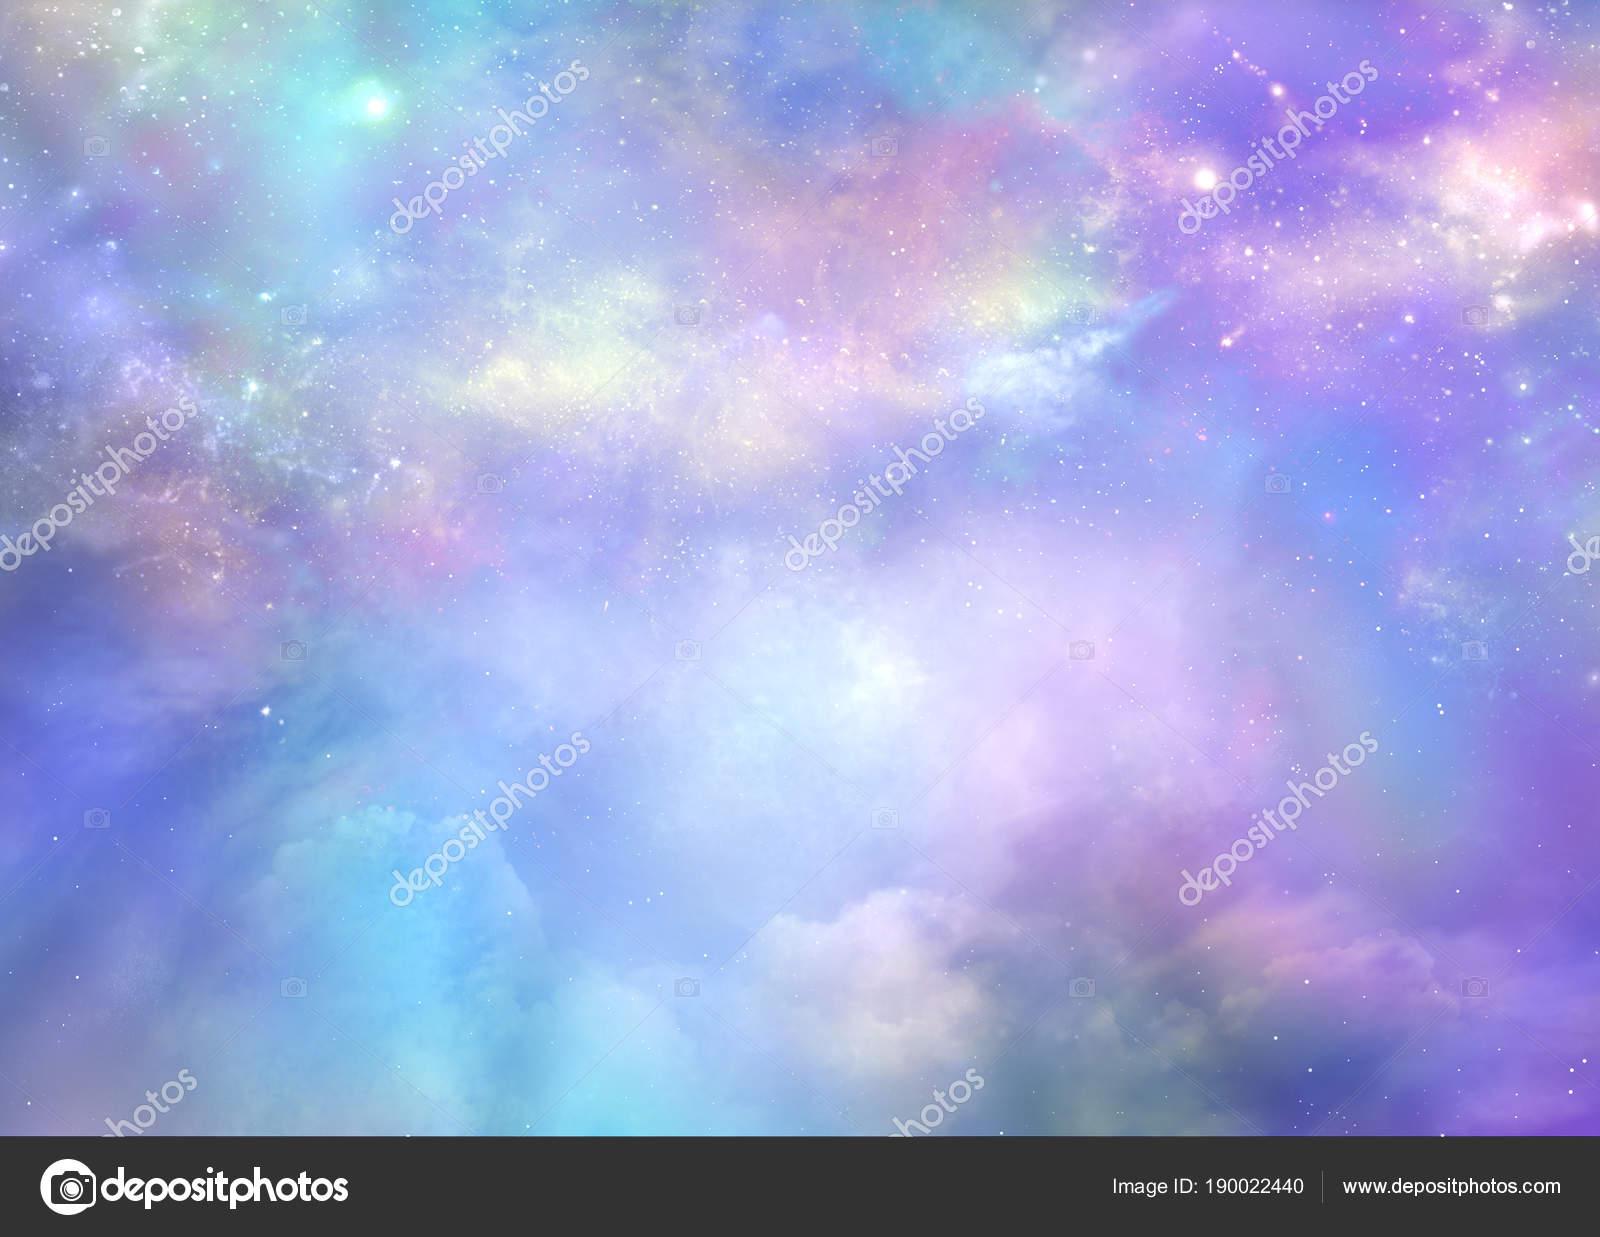 Heaven beautiful purple pink blue deep space background many stars heaven beautiful purple pink blue deep space background many stars stock photo thecheapjerseys Images